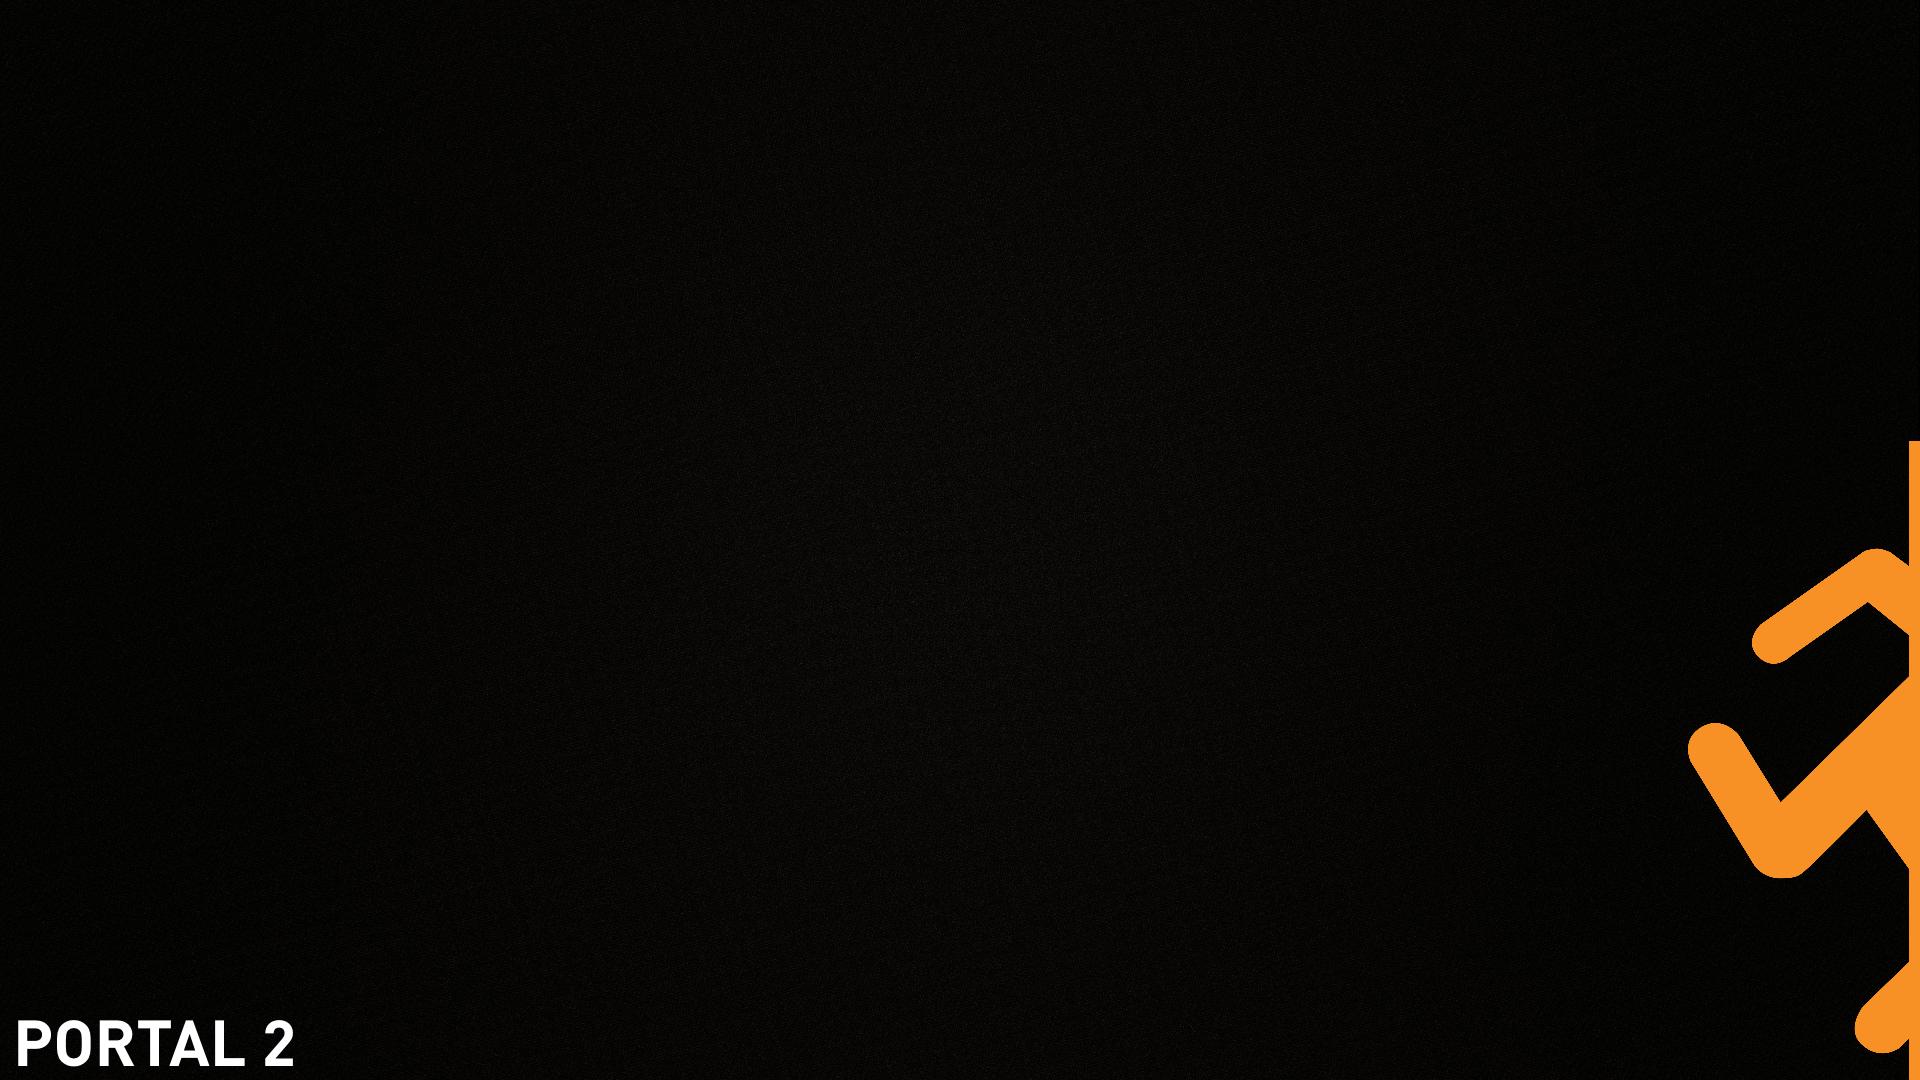 50] Portal Dual Screen Wallpaper on WallpaperSafari 1920x1080